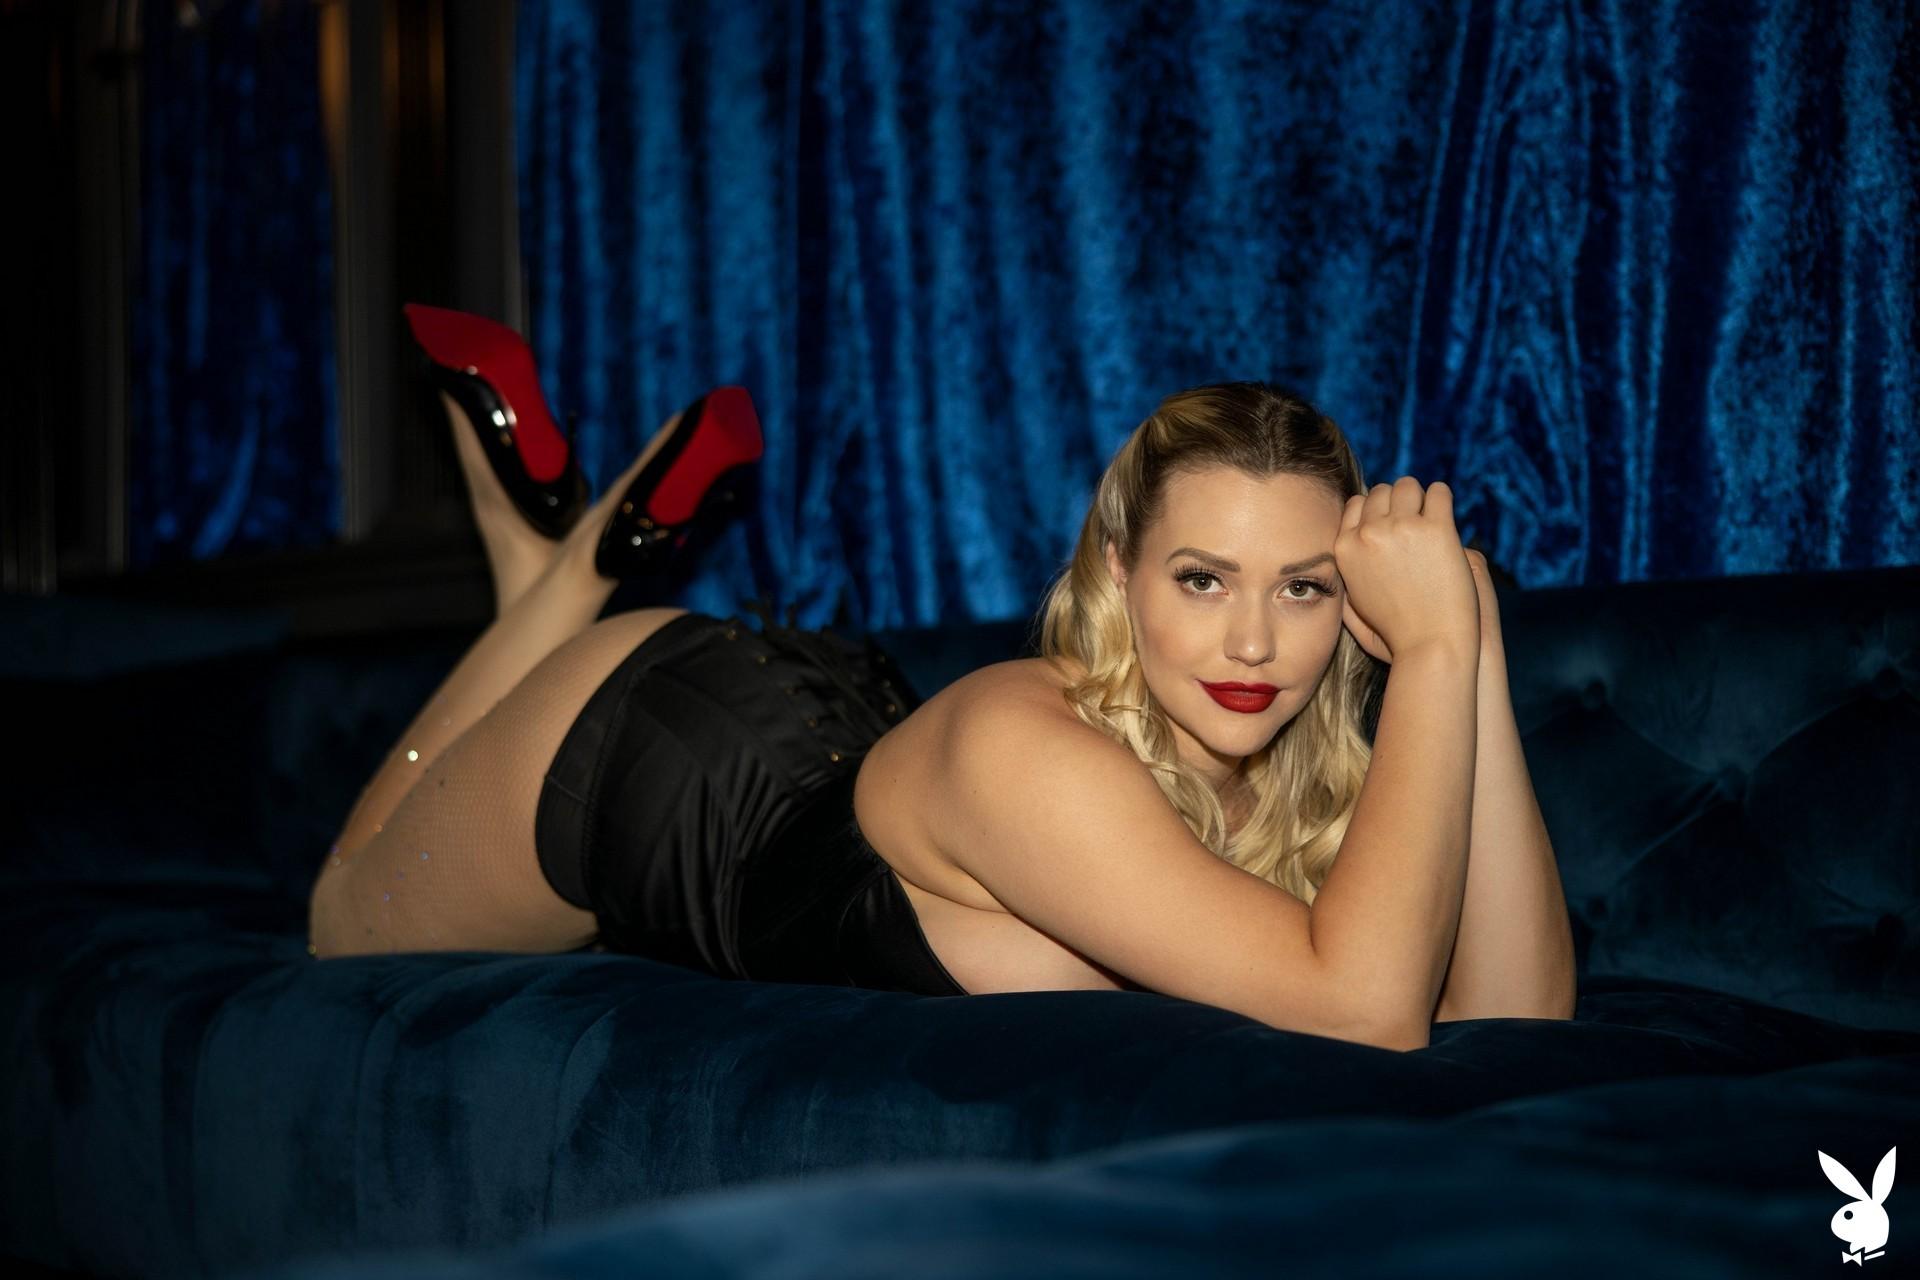 Mia Malkova In Off The Clock Playboy Plus (41)